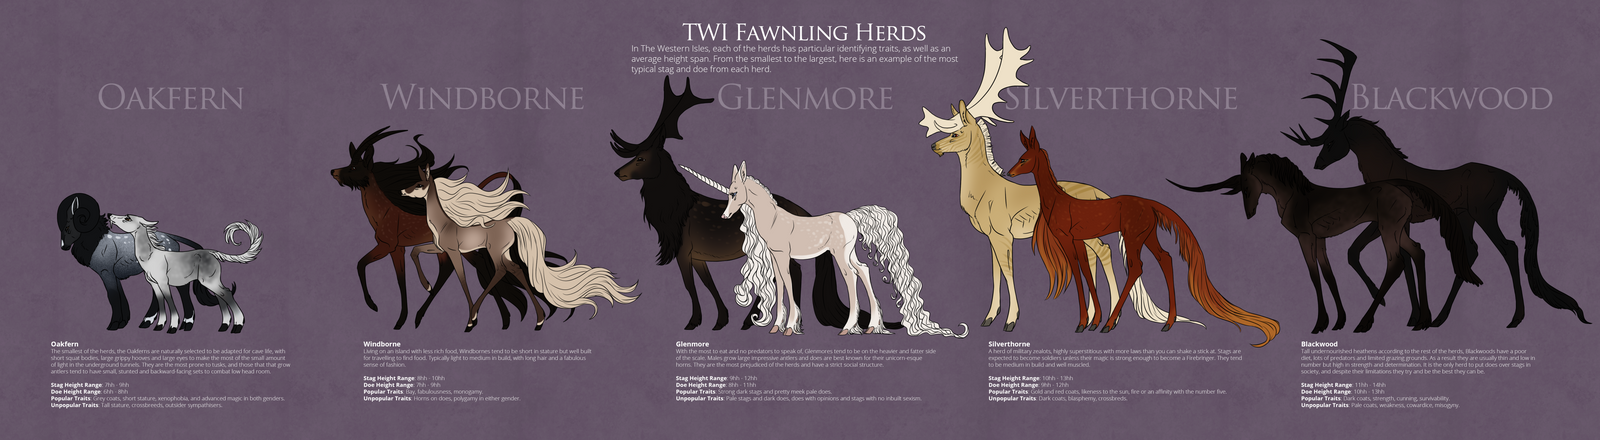 Fawnling Breedsheet: Herds